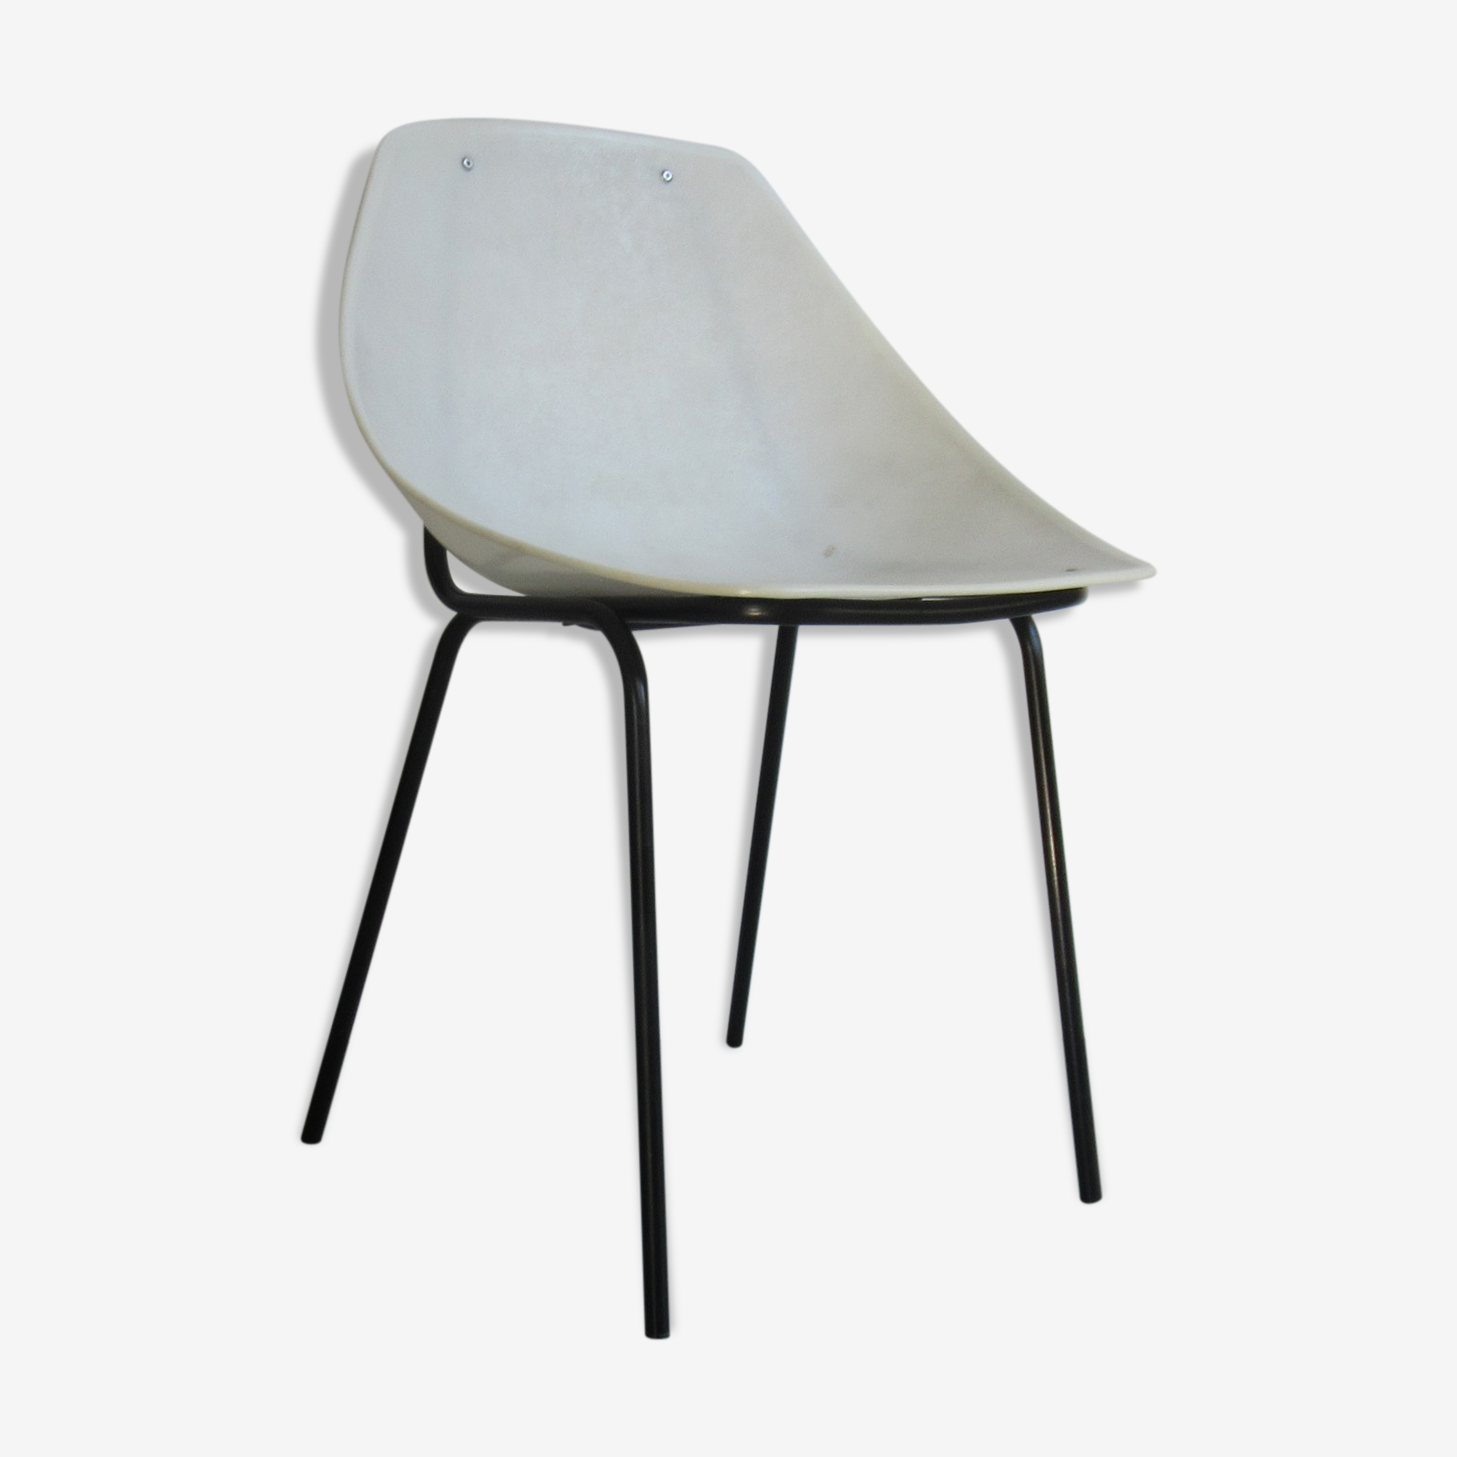 Chair Pierre Guariche for Meurop, 1961